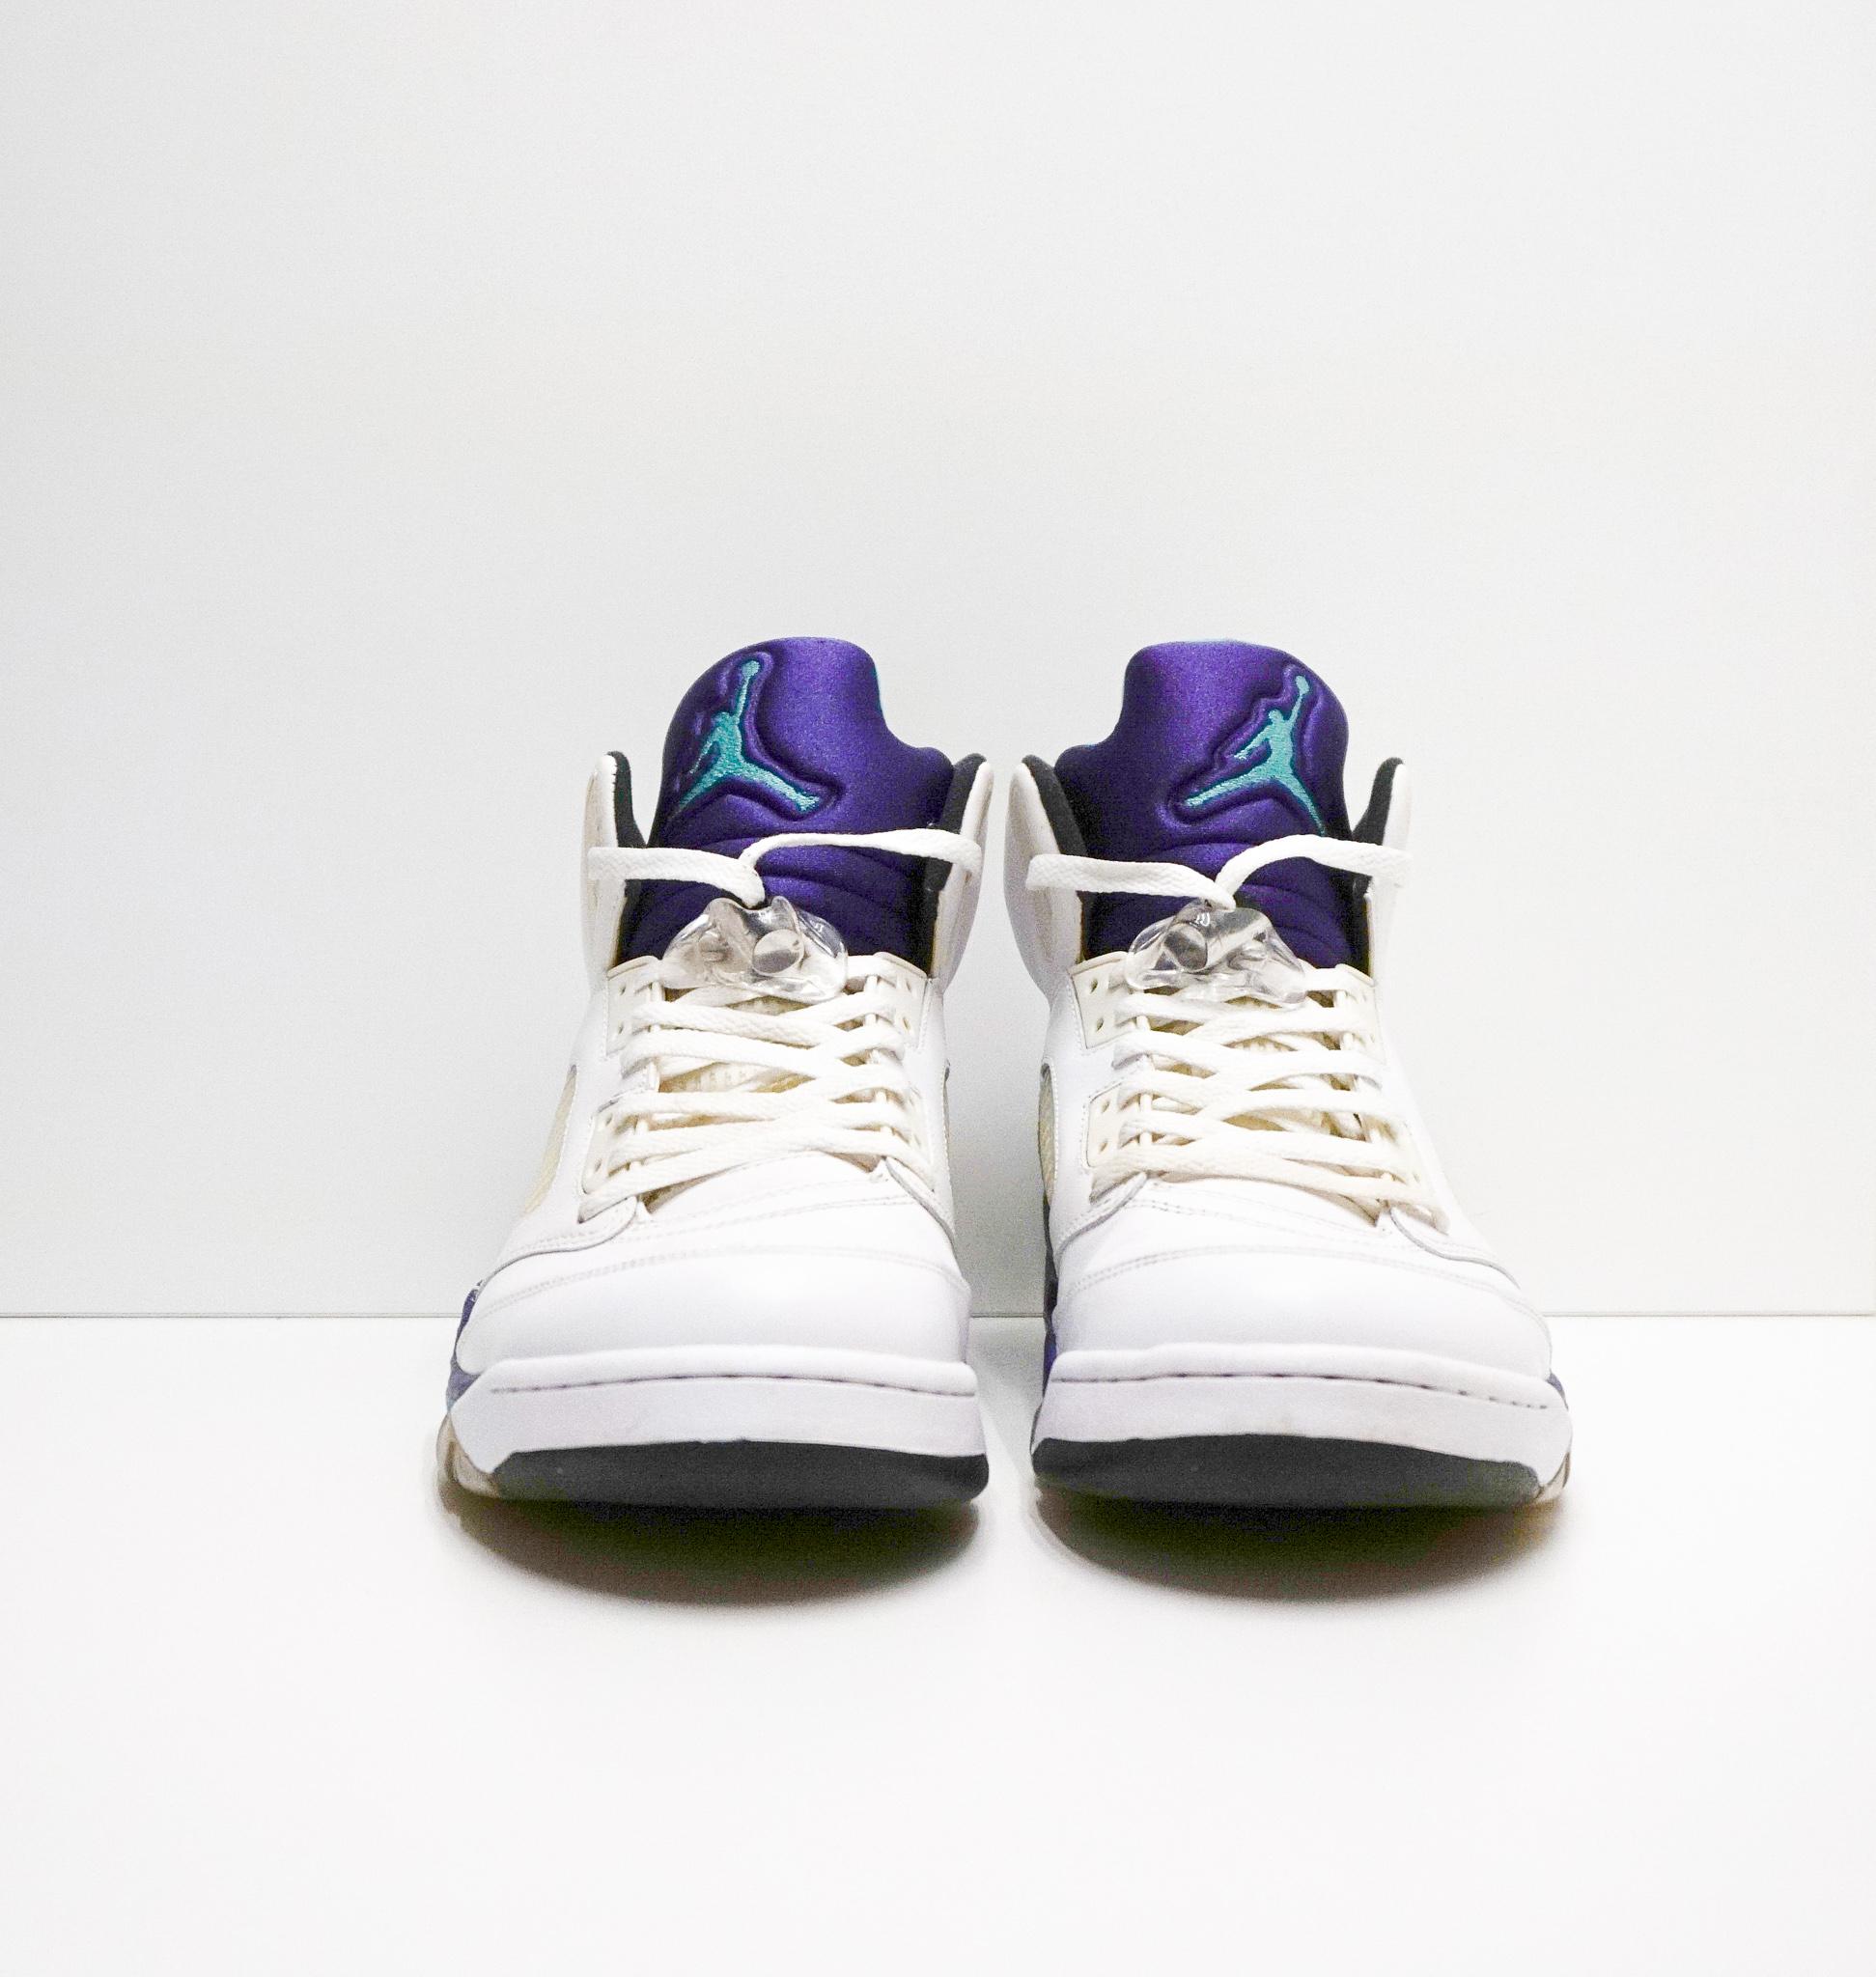 Jordan 5 Retro Grape (2013)